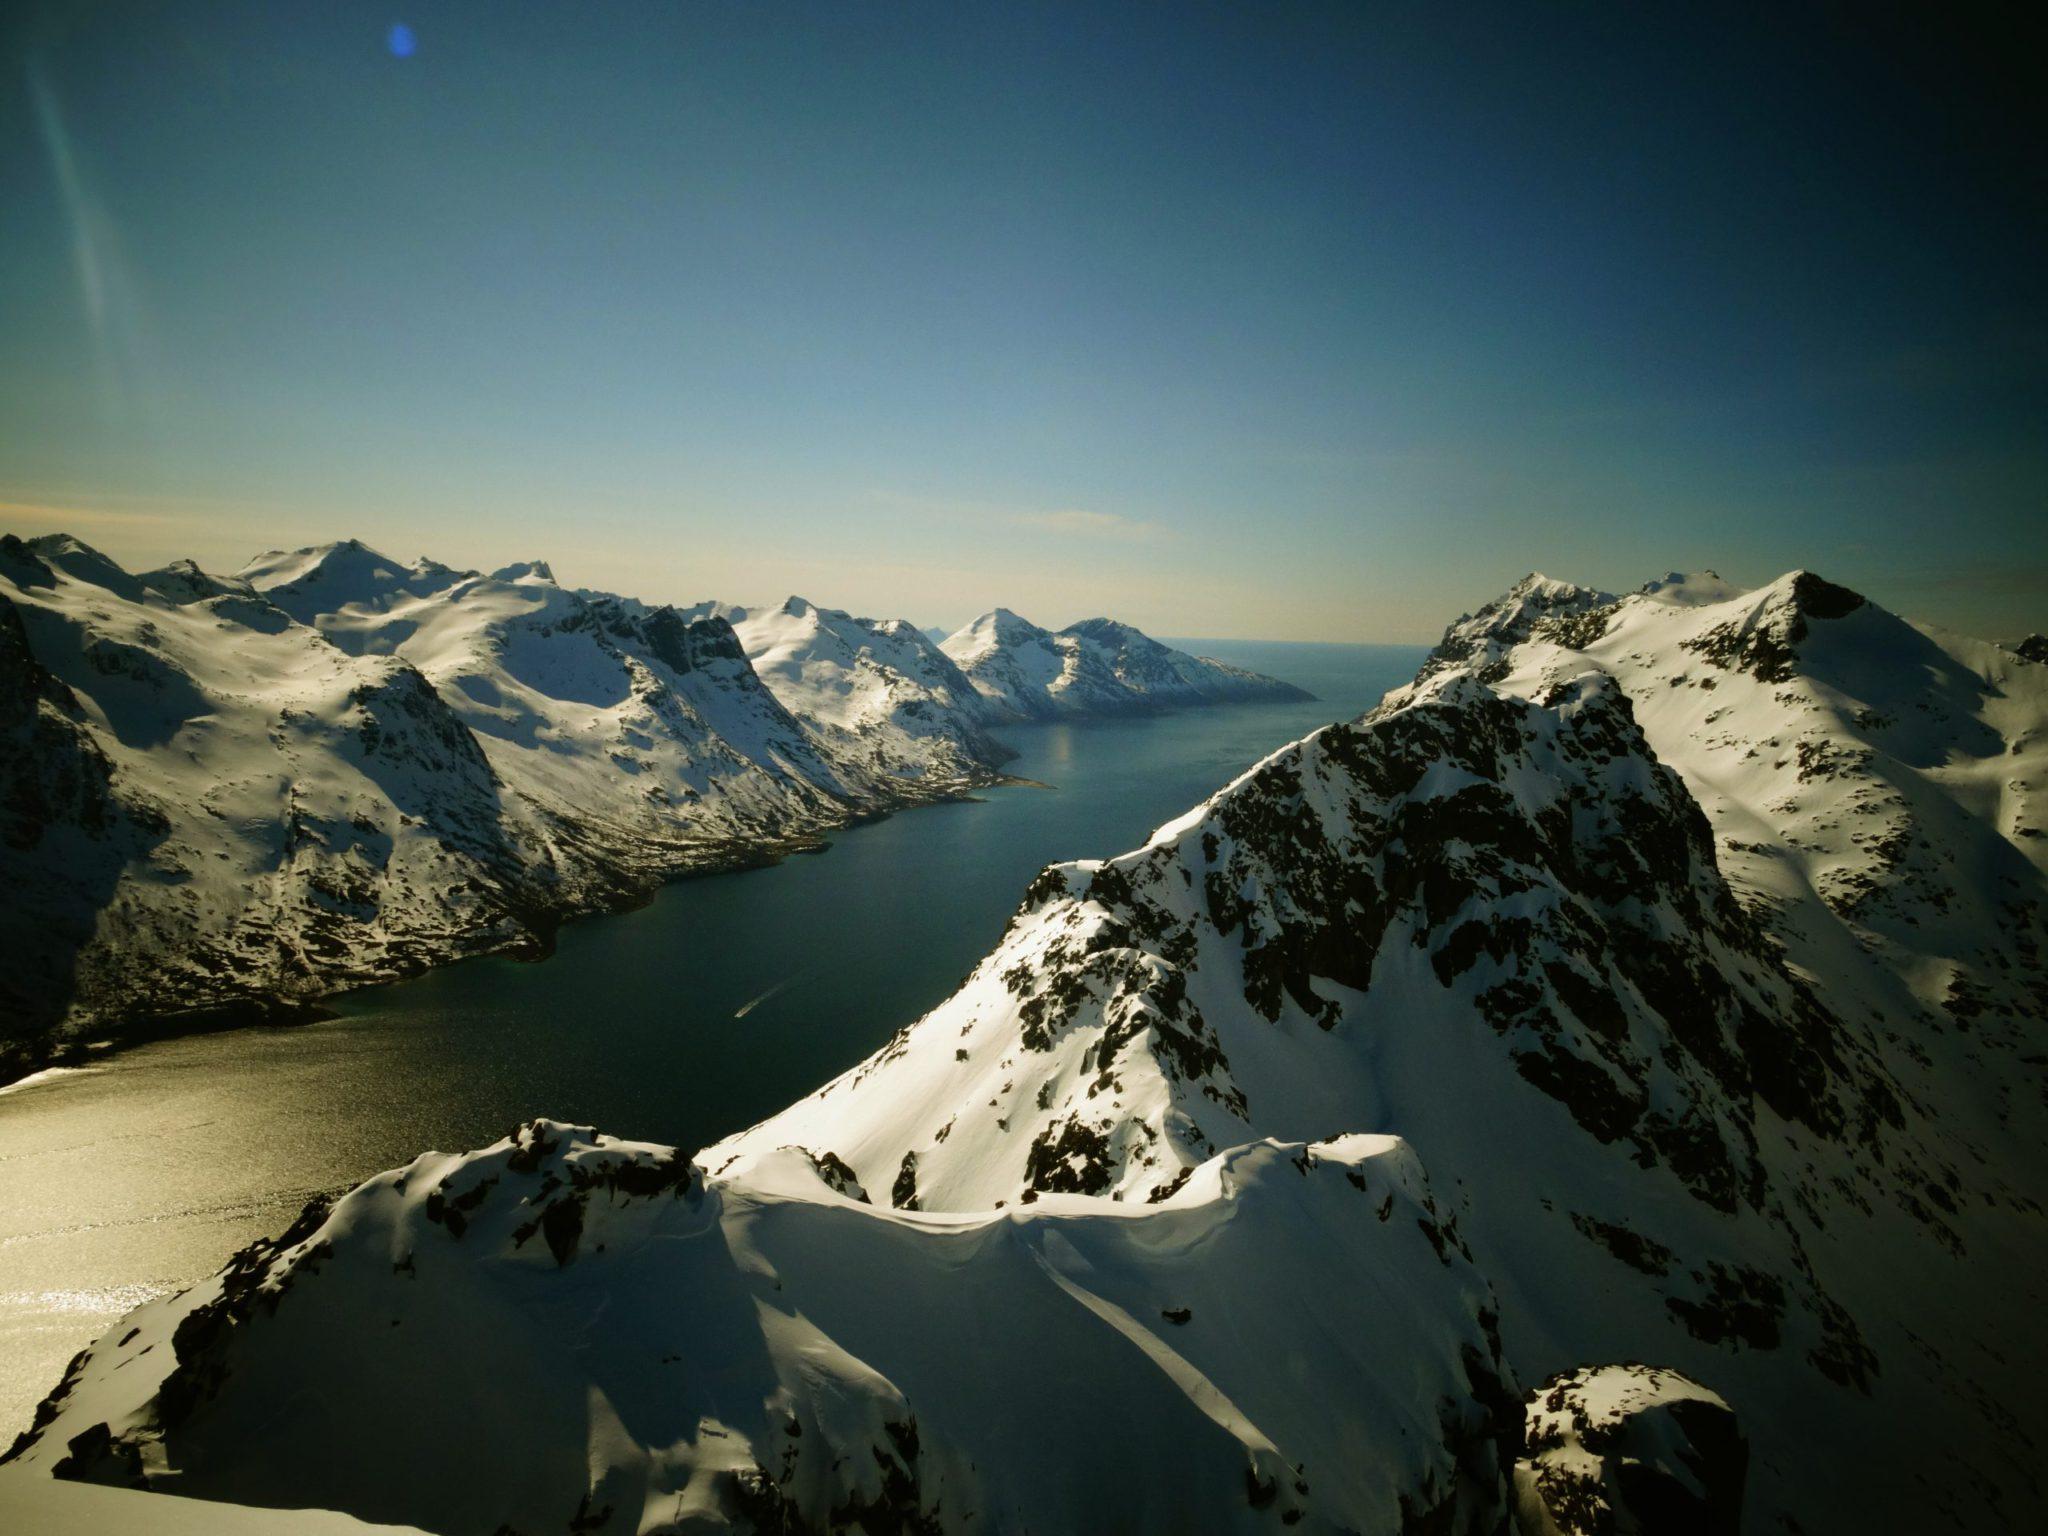 Norway splitboarding holiday: Norwegian freeride snowboarding